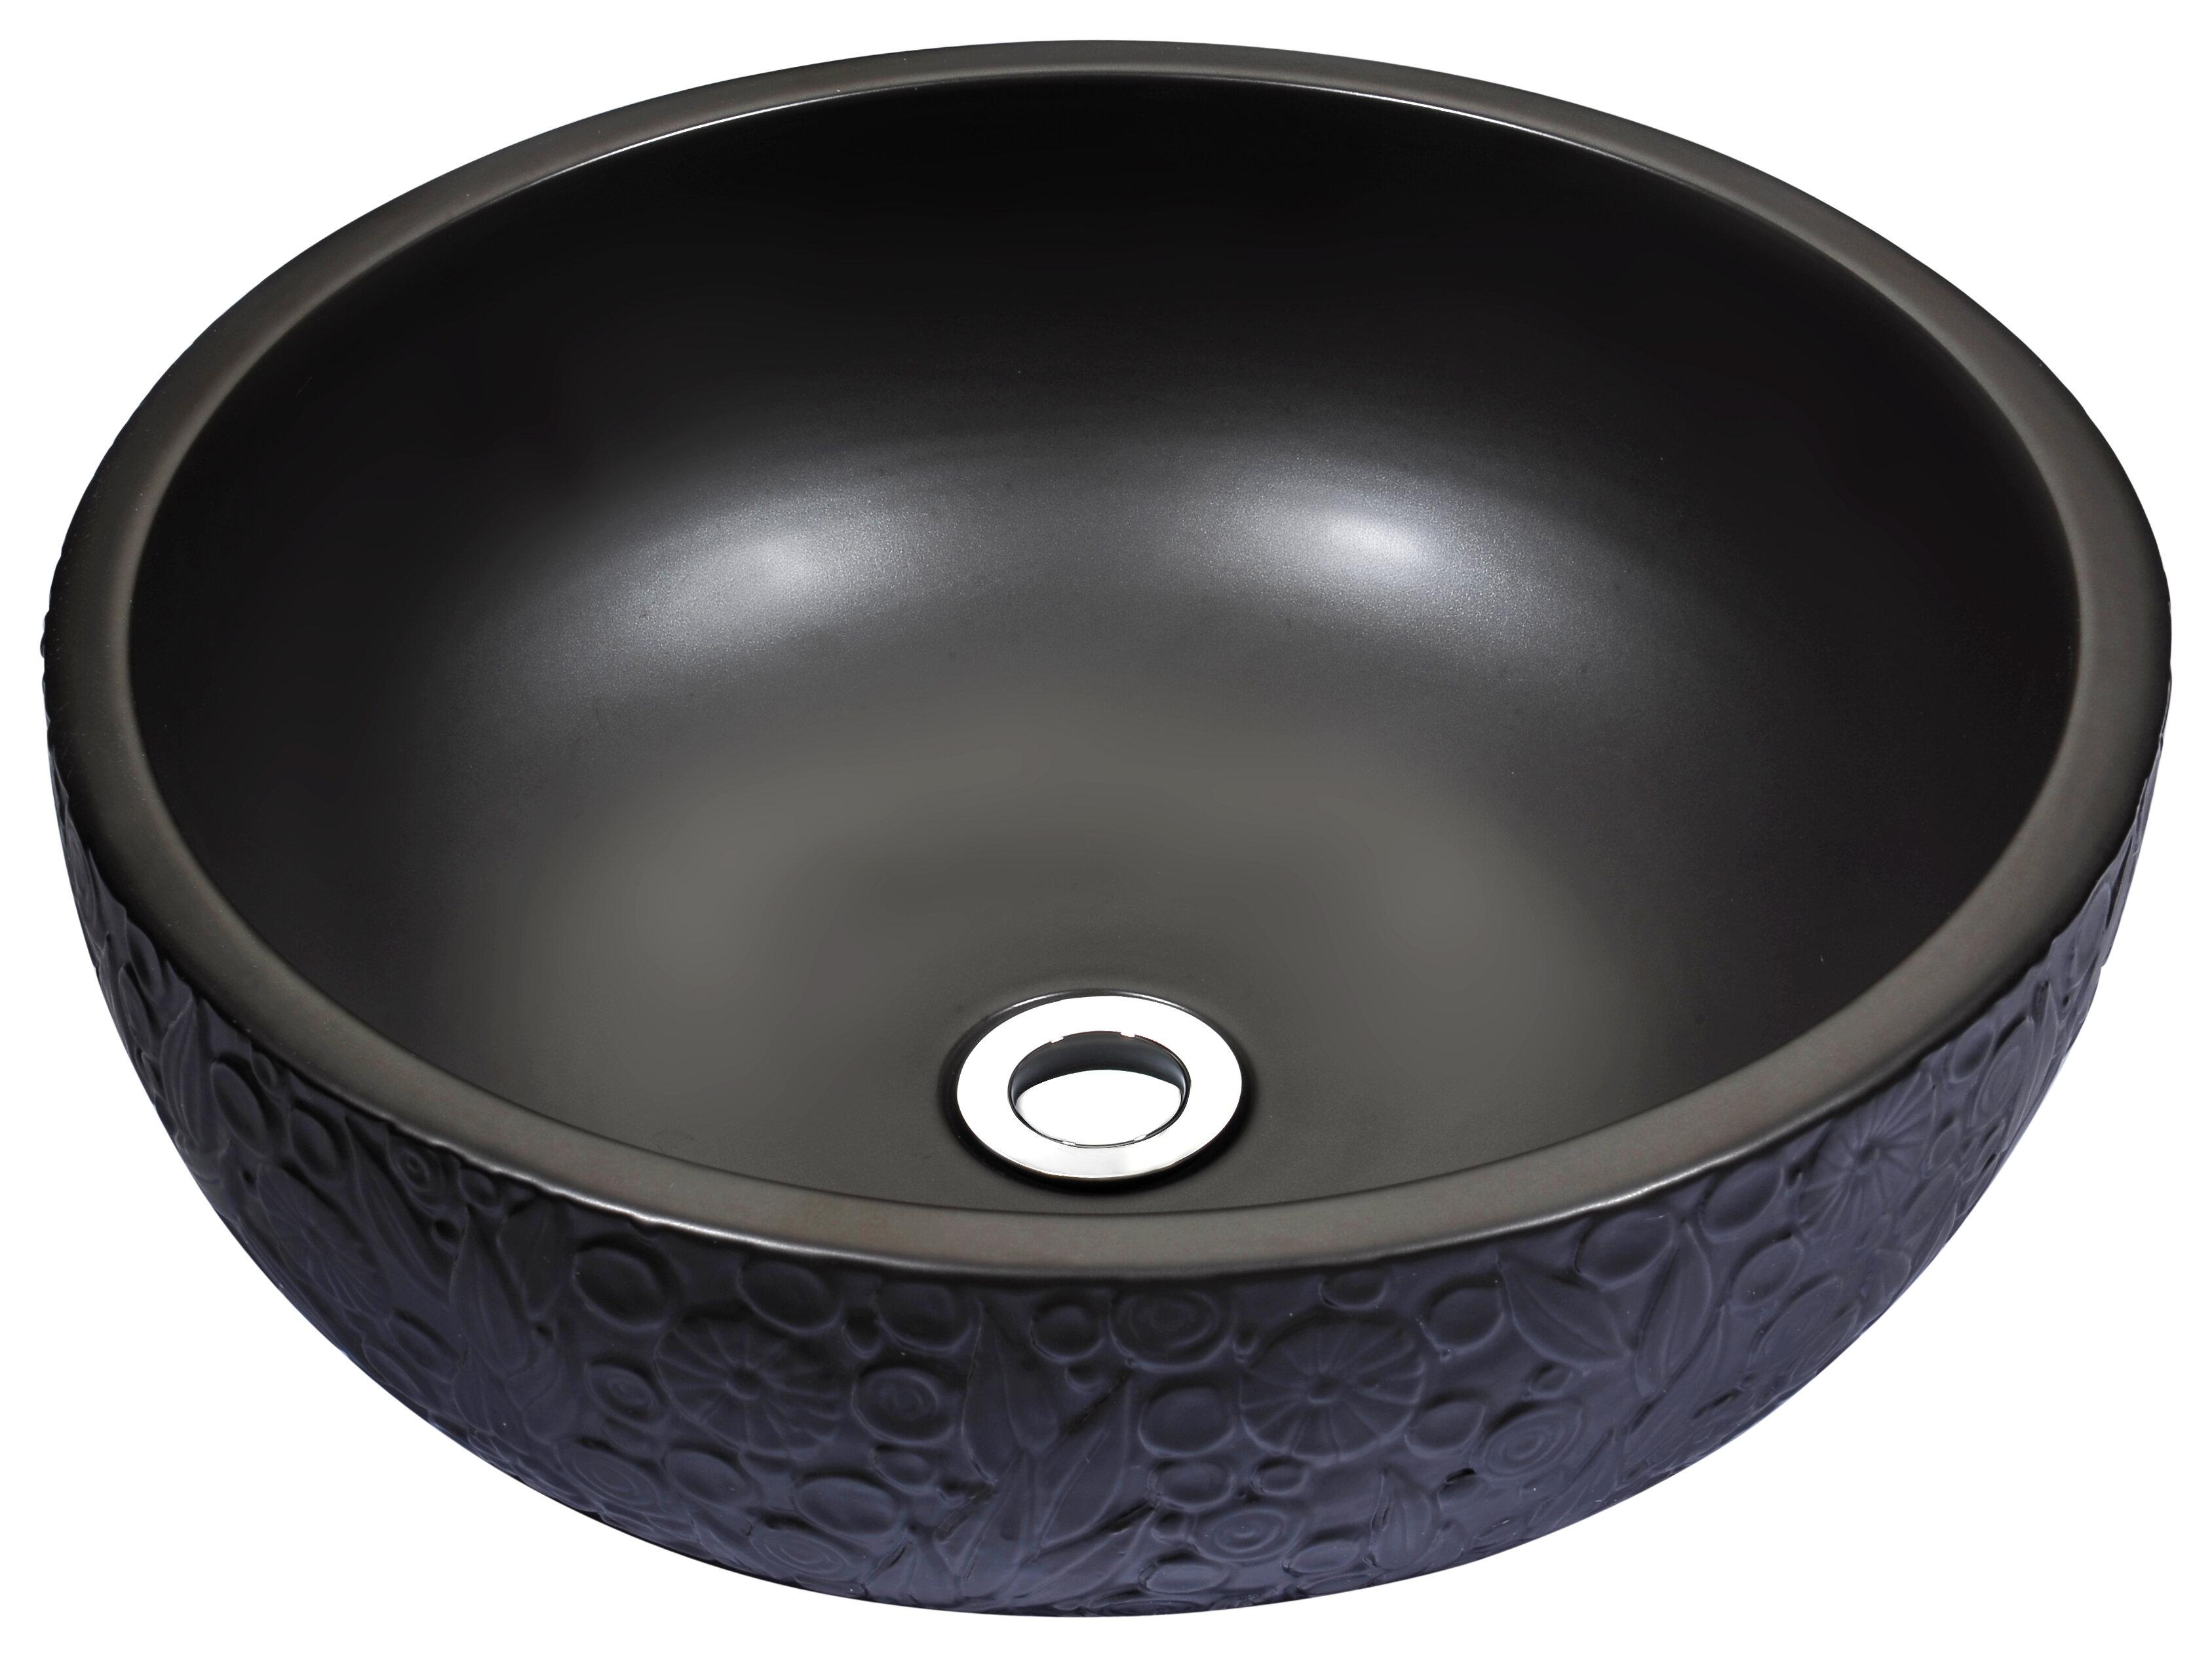 Anzzi Stellar Series Black Ceramic Circular Vessel Bathroom Sink Perigold